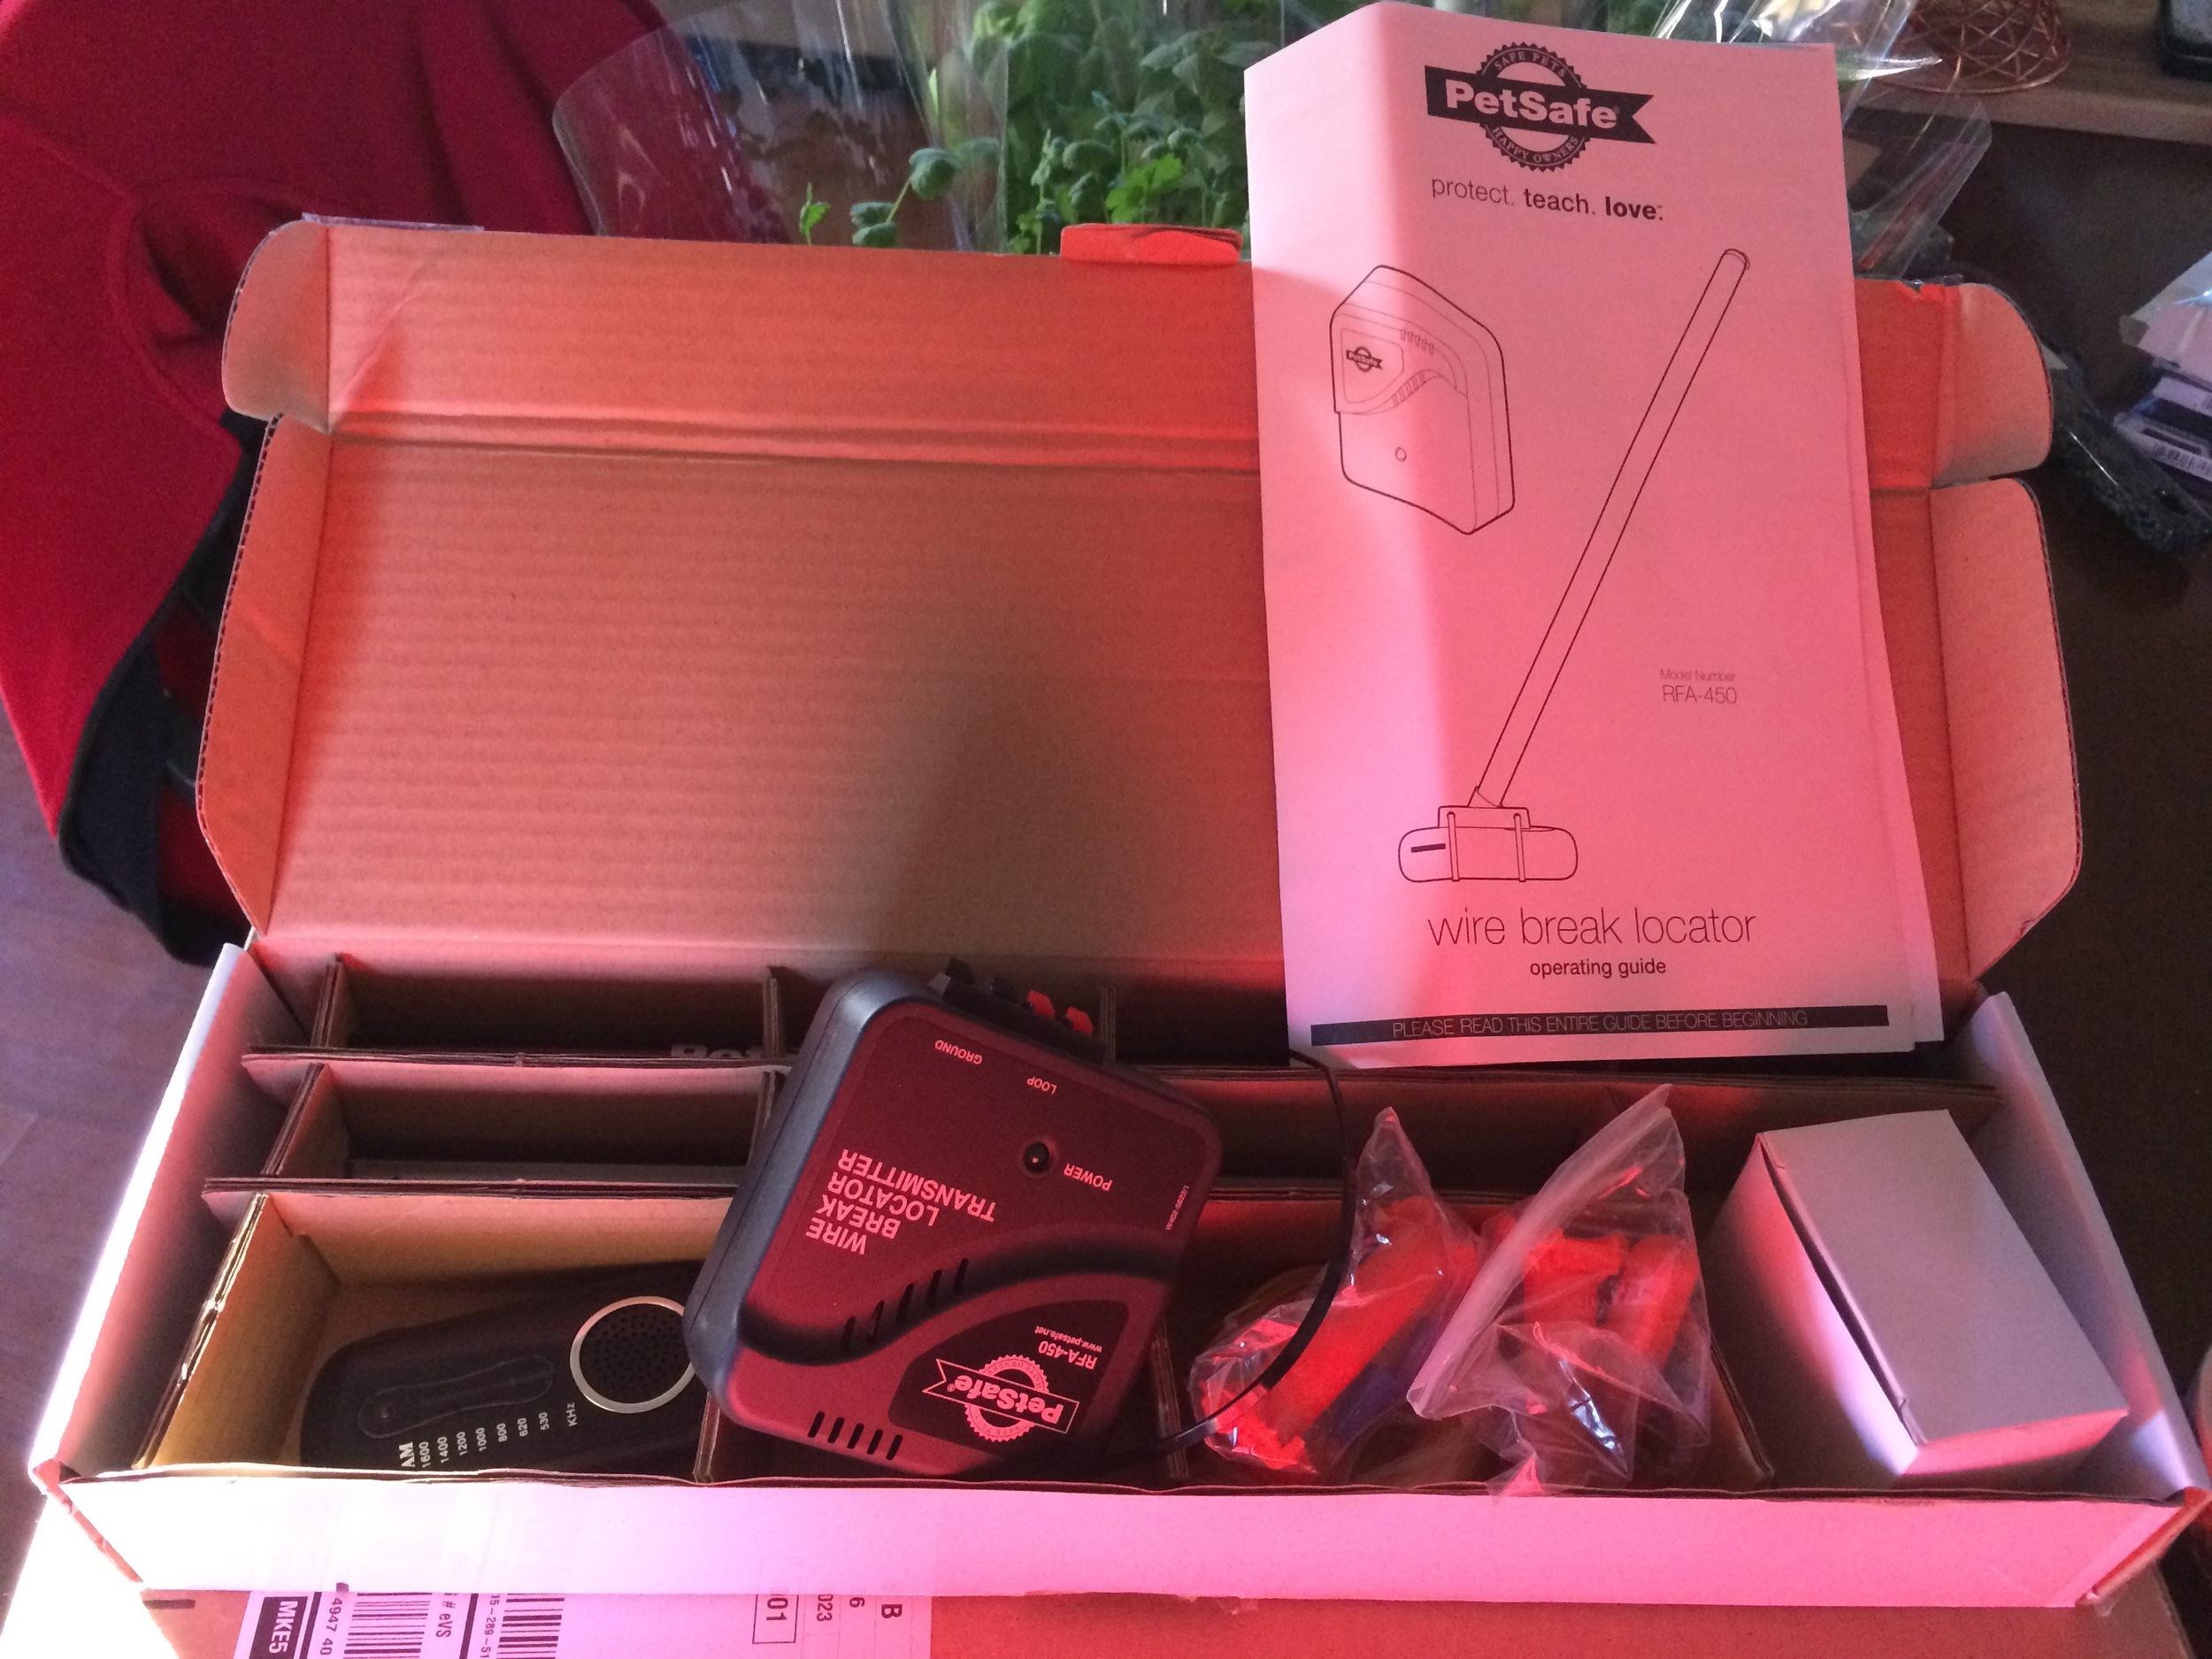 Wire Break Locator kit as it comes in the box